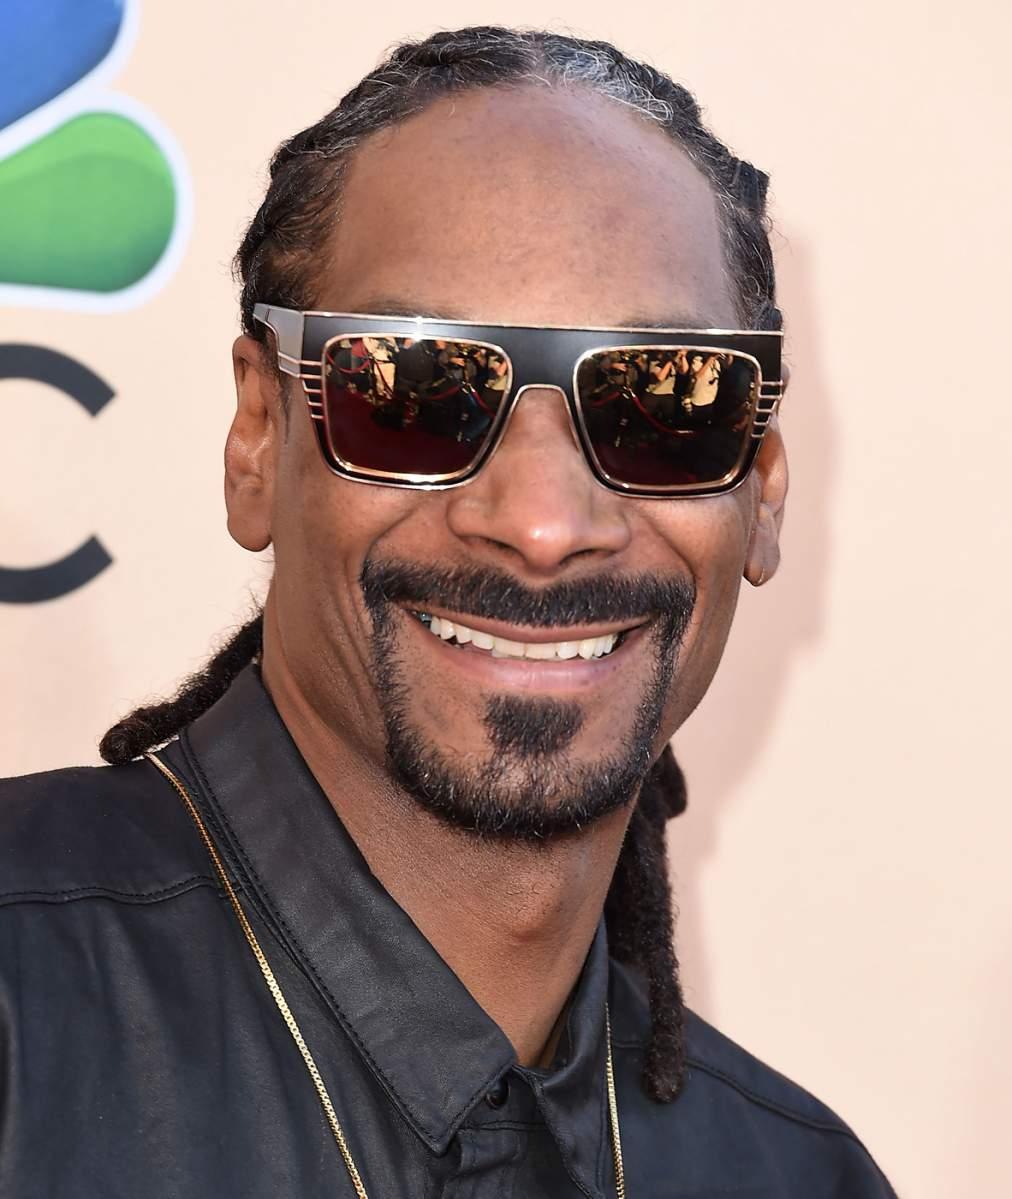 Snoop Dogg Wallpaper Iphone 6 Labzada Wallpaper